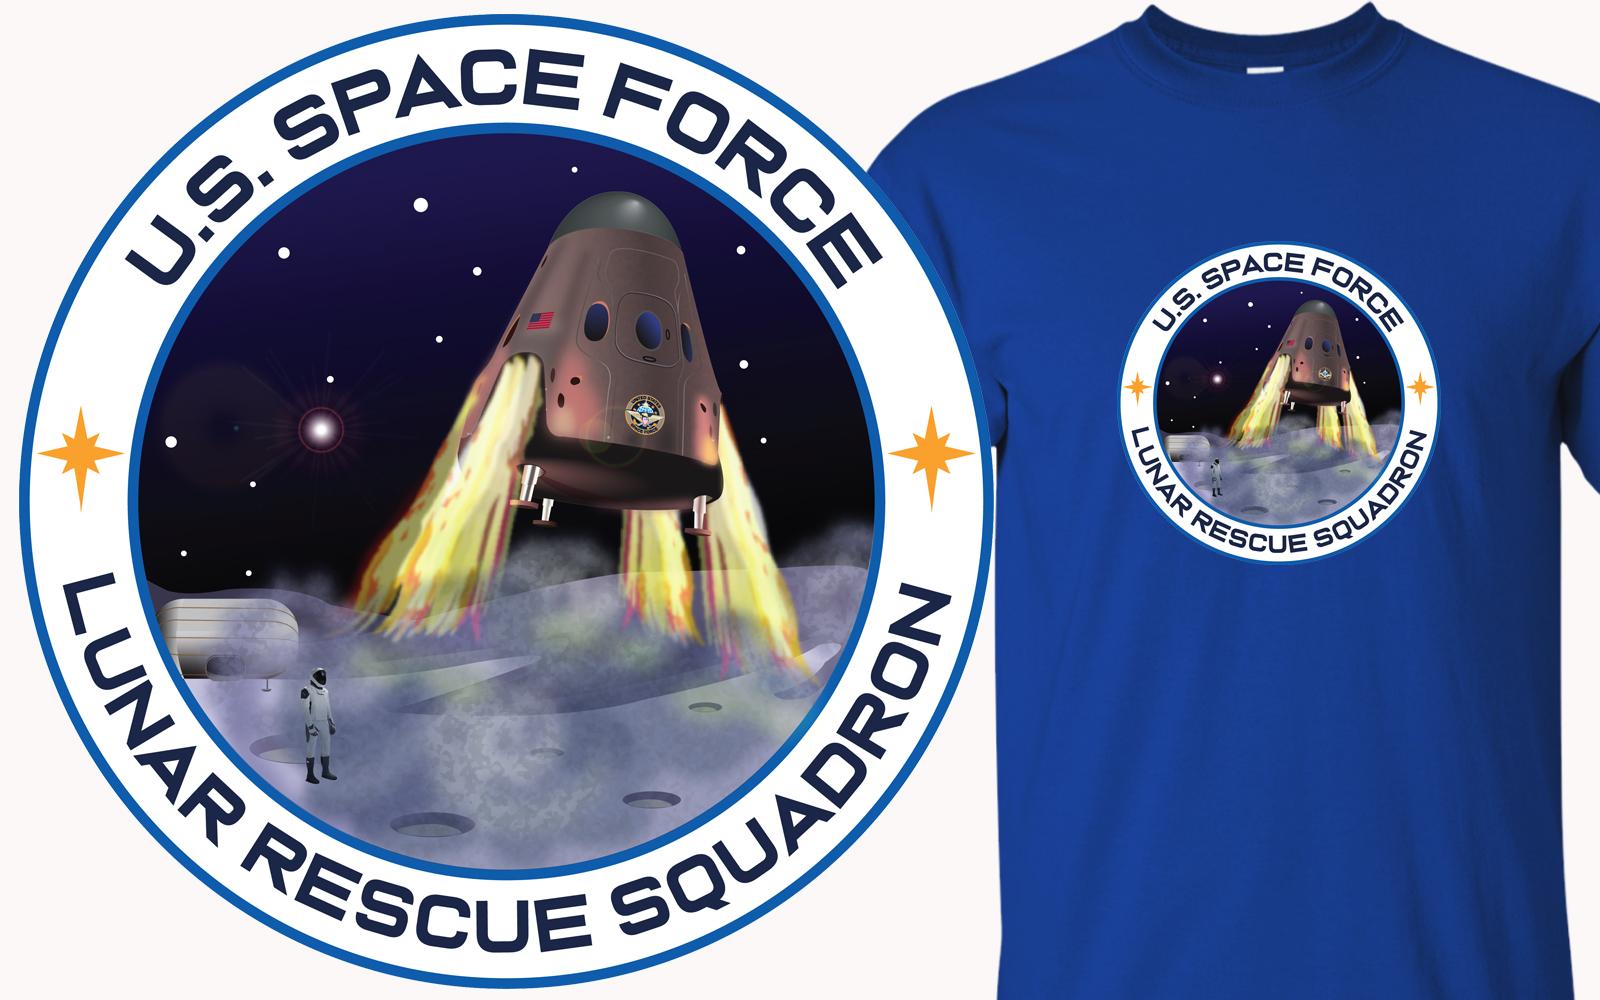 Space Force Lunar Rescue